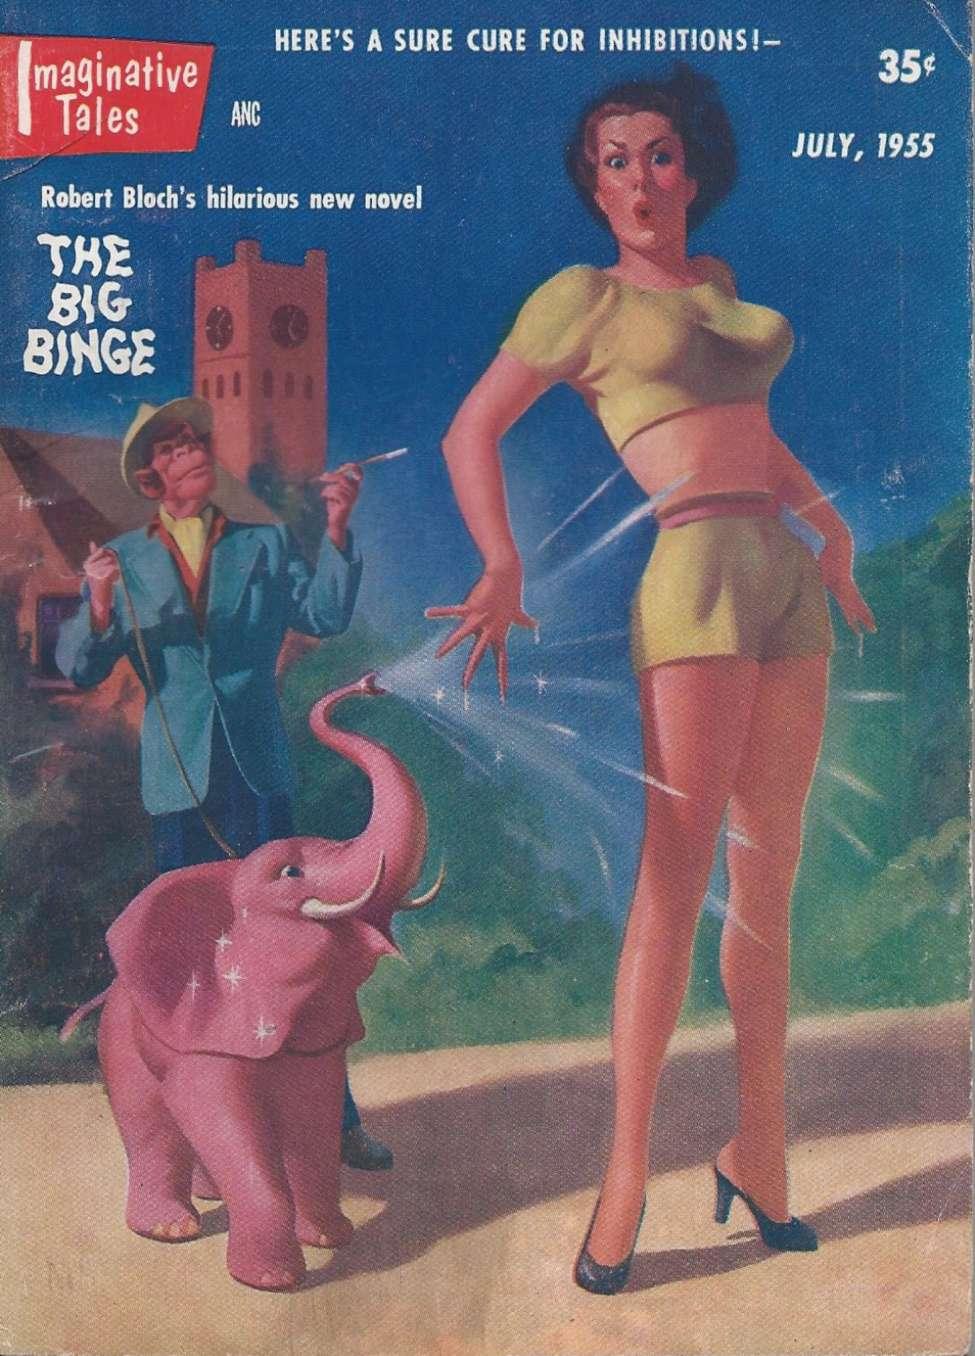 Comic Book Cover For Imaginative Tales v01 06 - The Big Binge - Robert Bloch